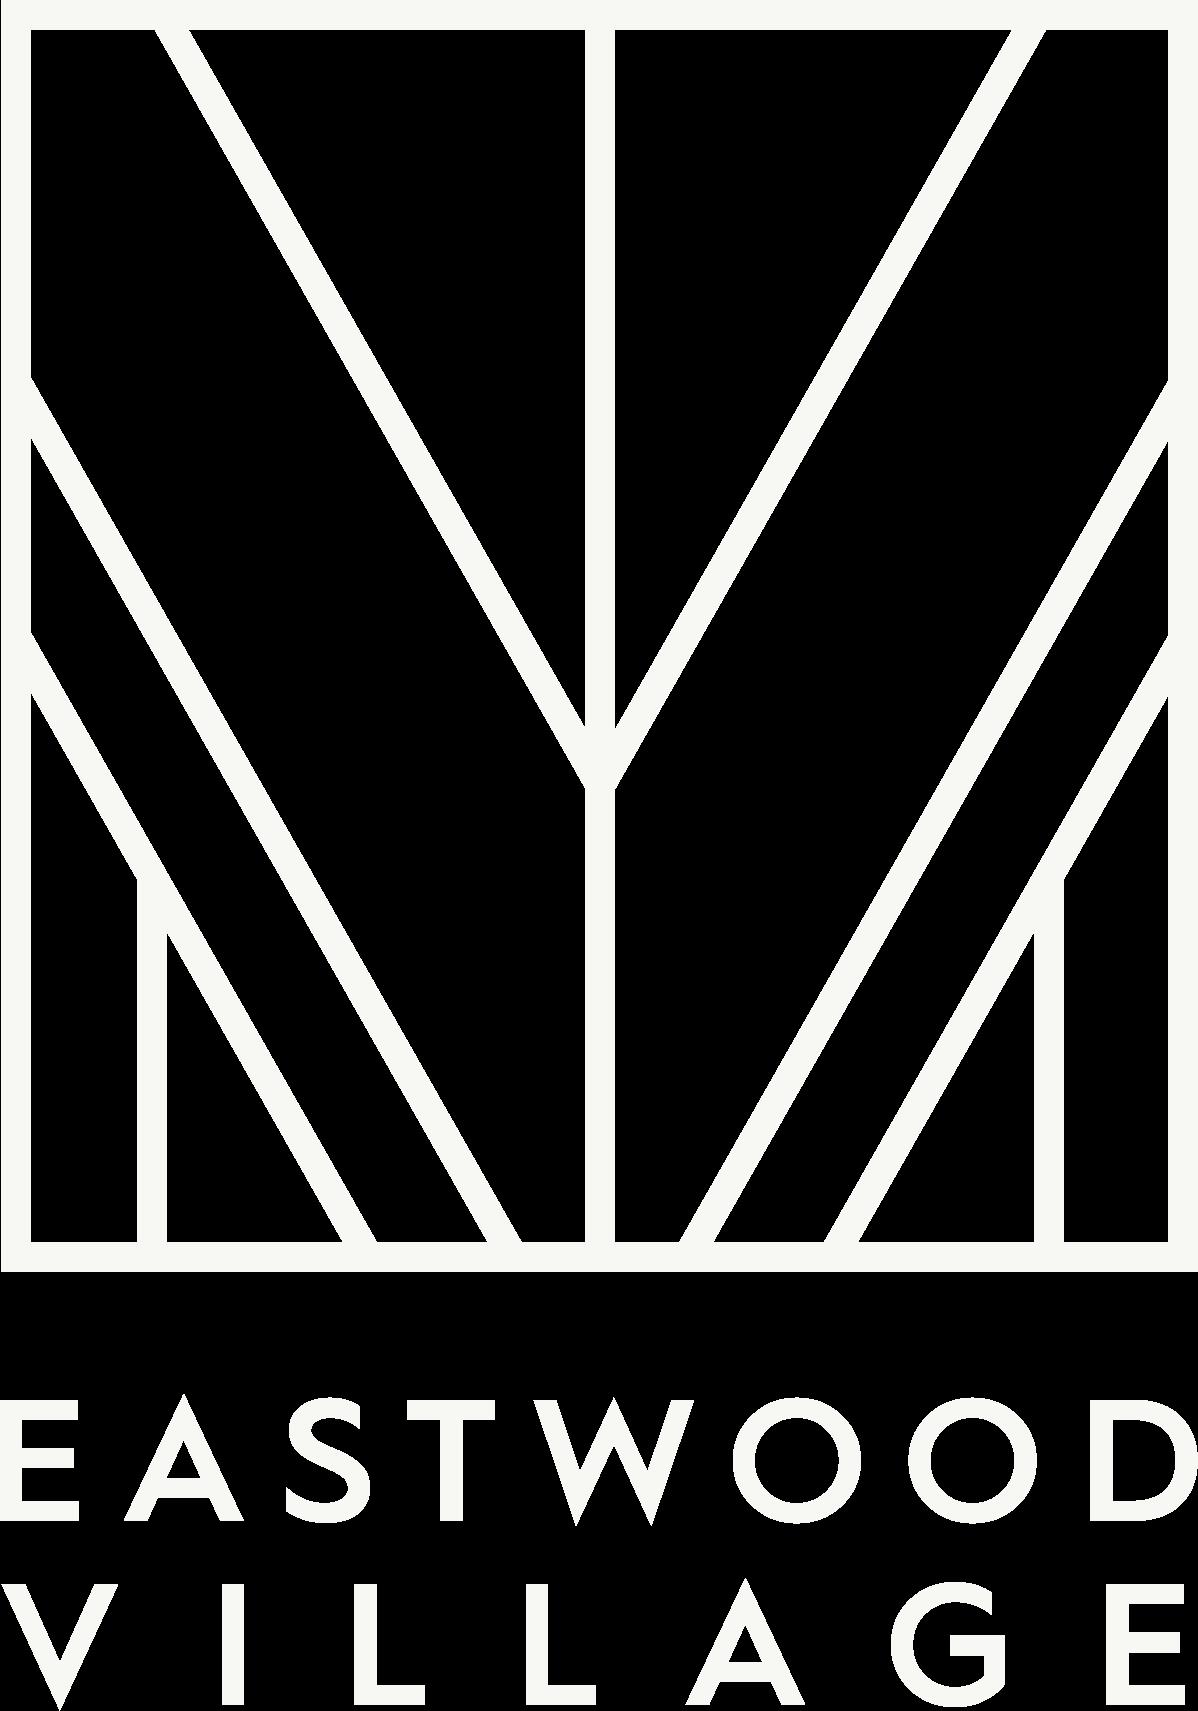 Eastwood Village